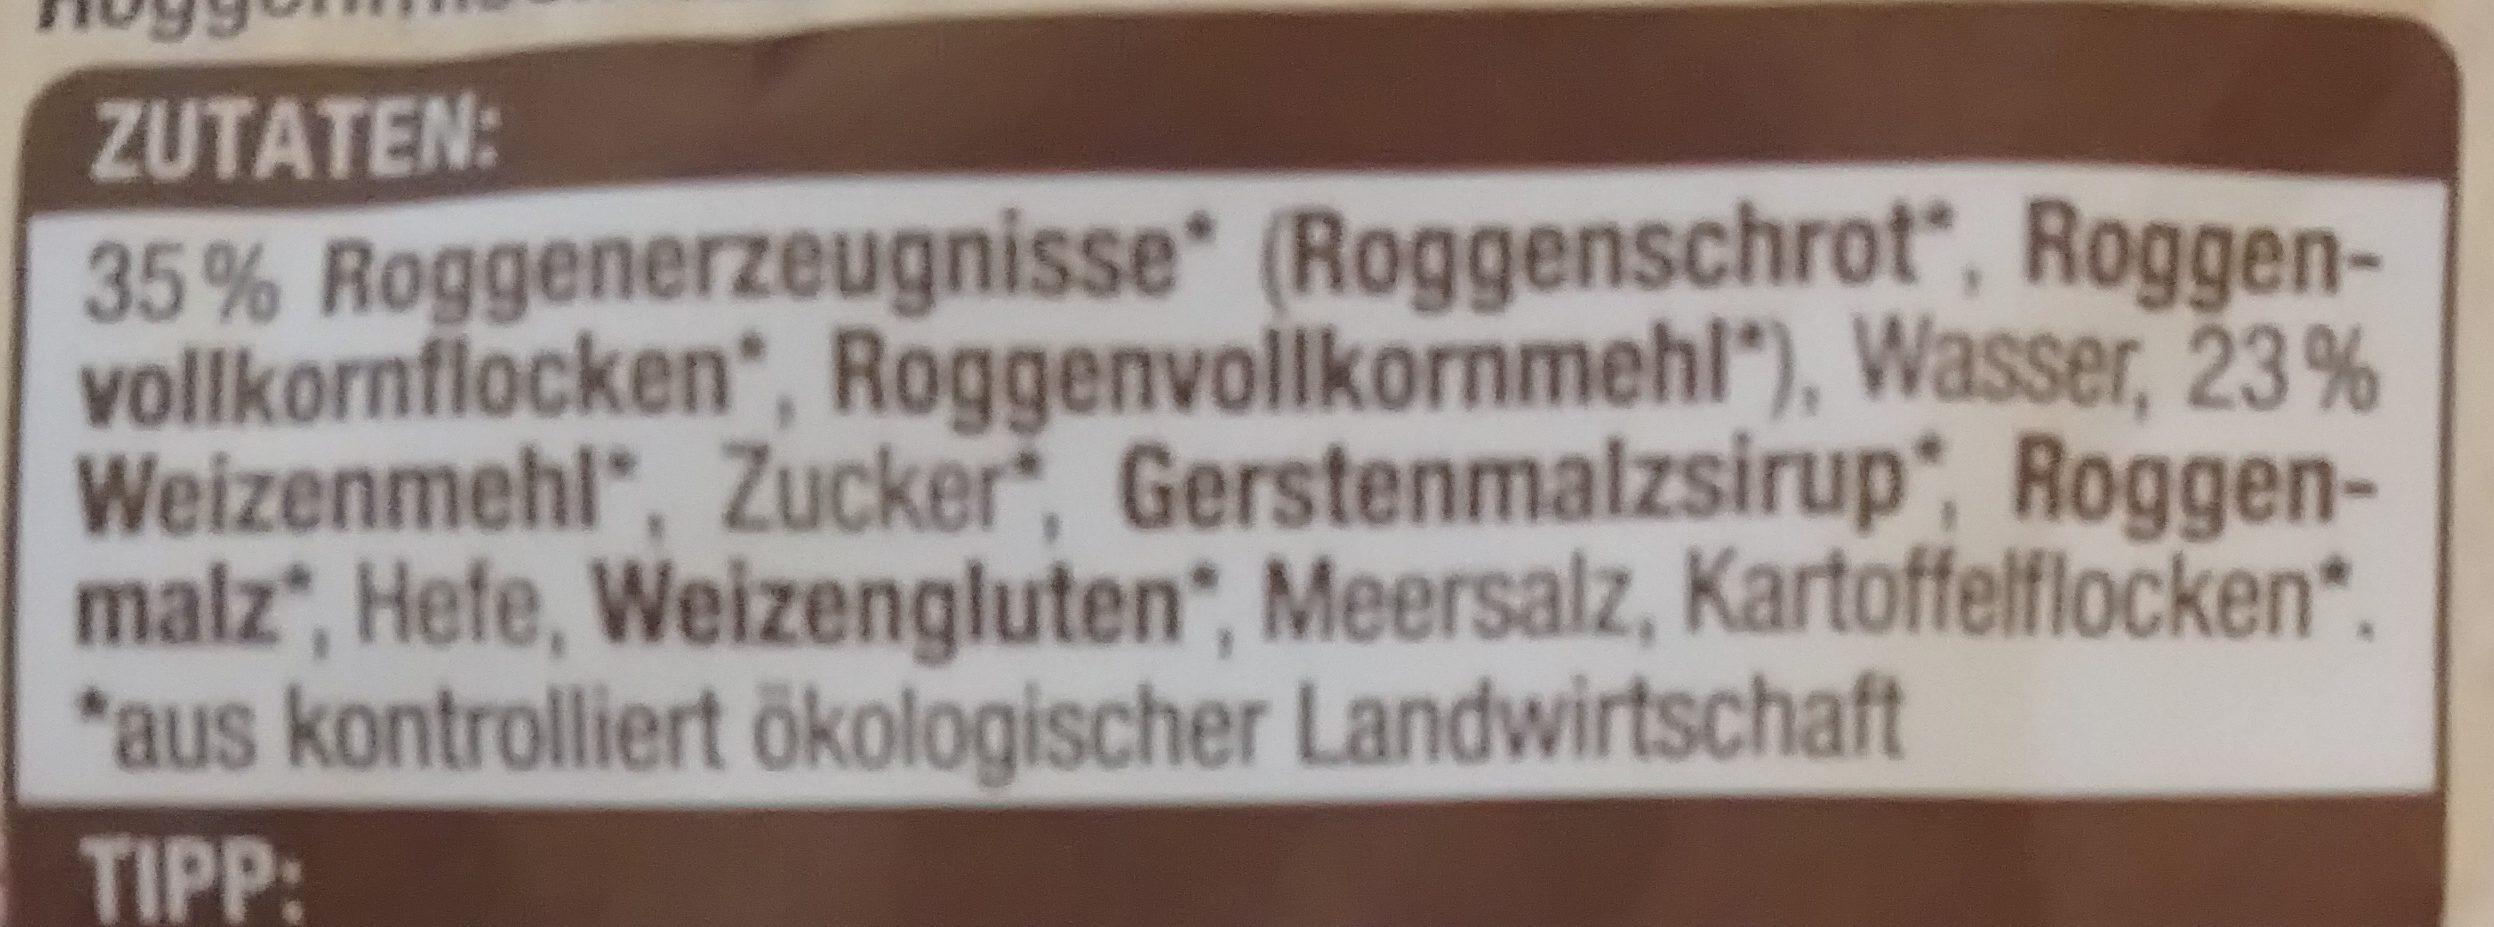 Edeka Bio Finnisch Toasties - Inhaltsstoffe - de